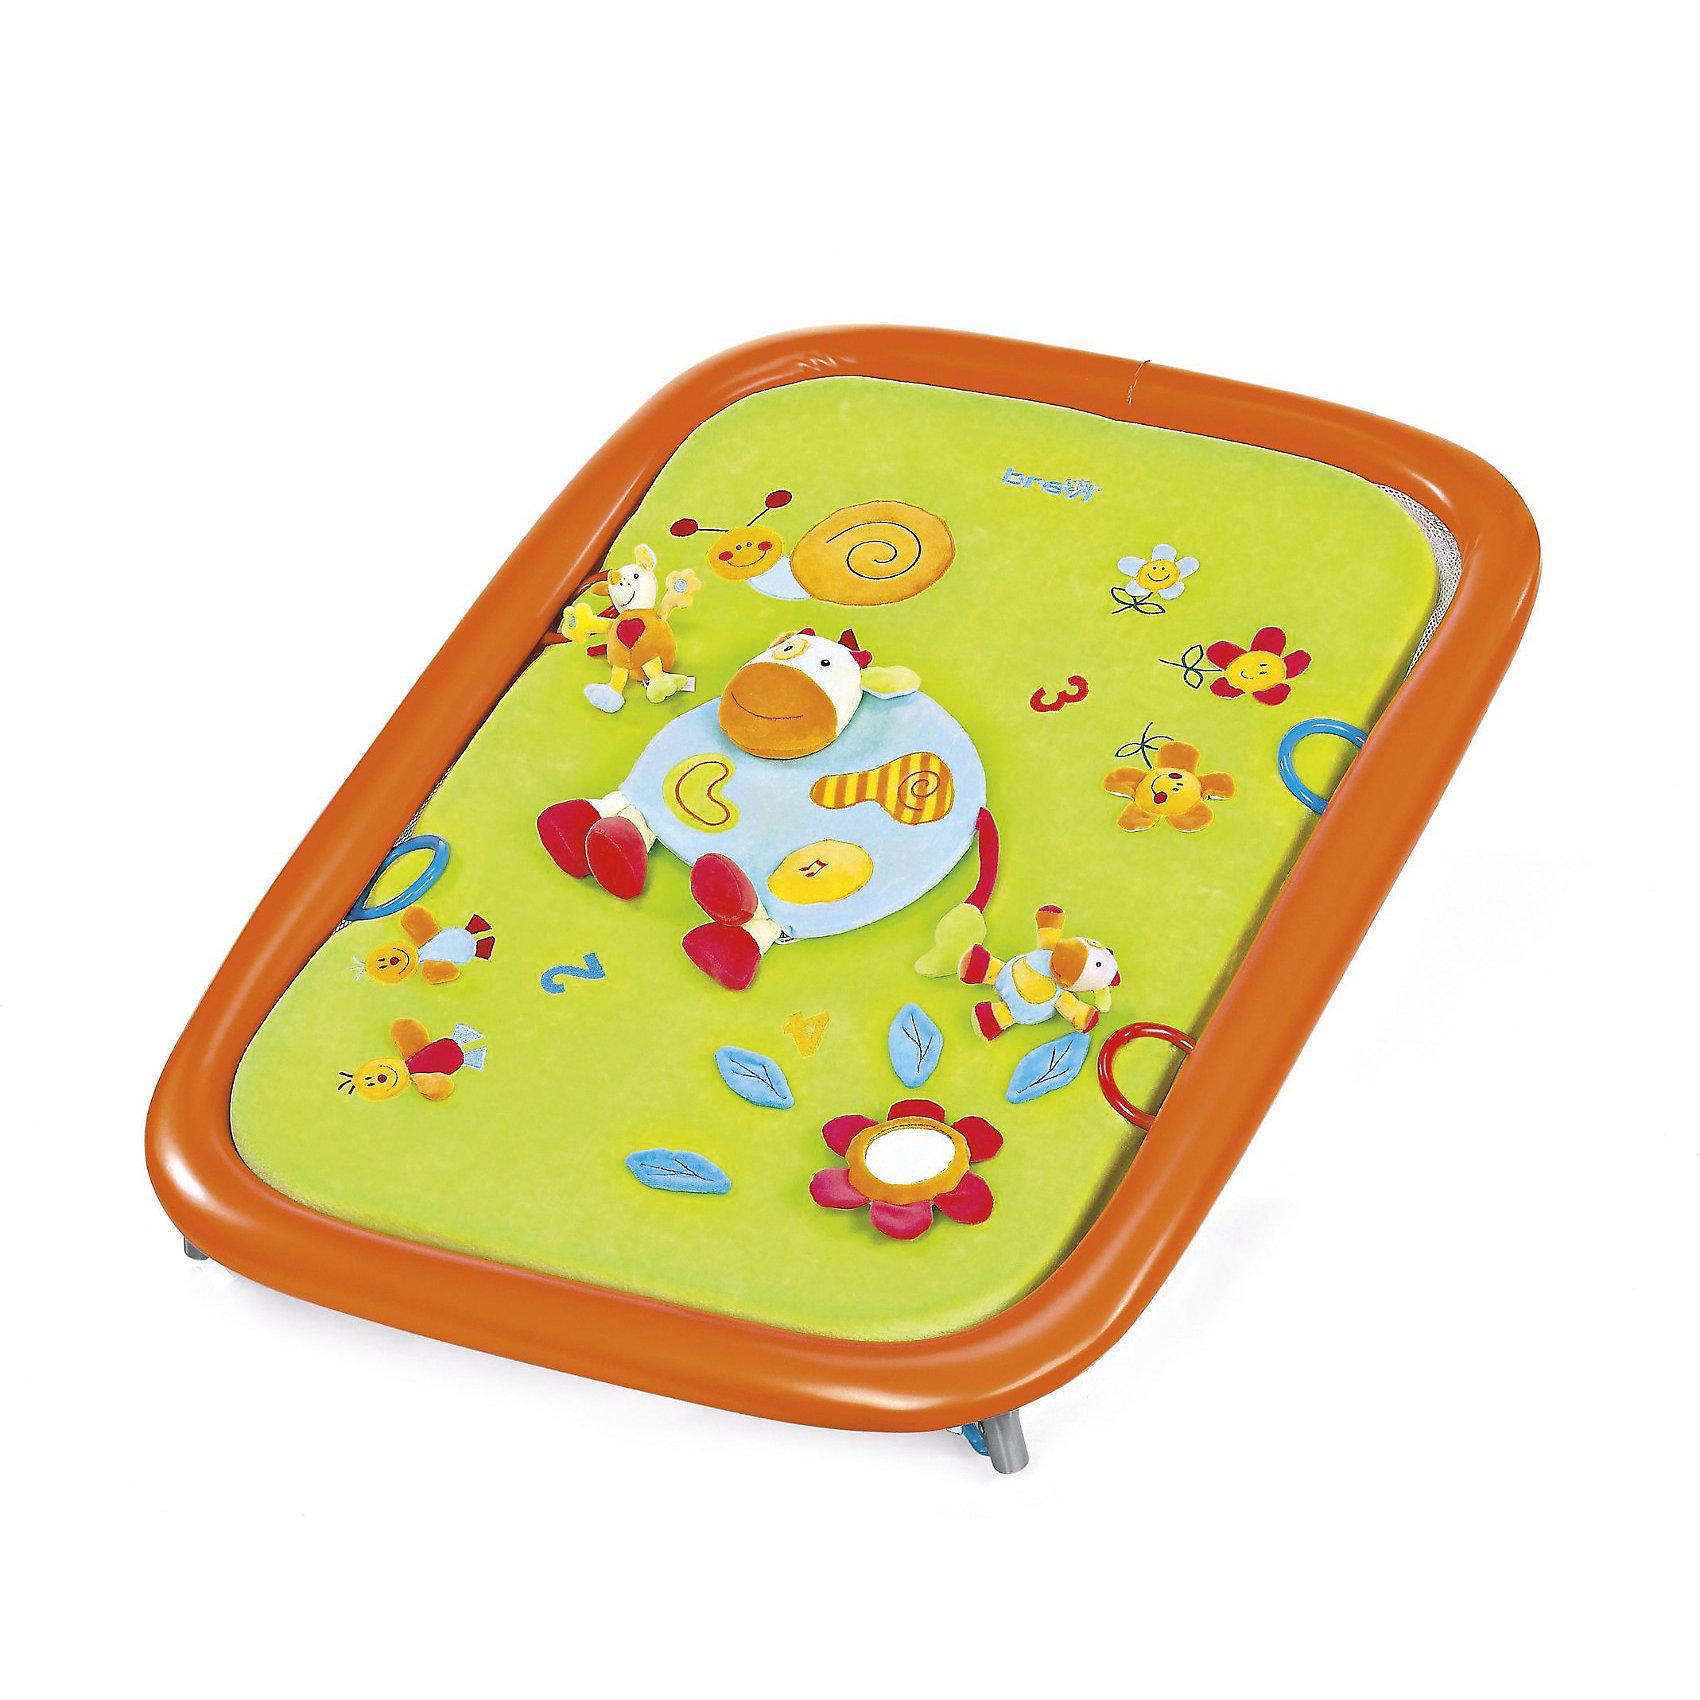 ����� ������� Soft Play Green Farm, Brevi,  ������ (brevi)